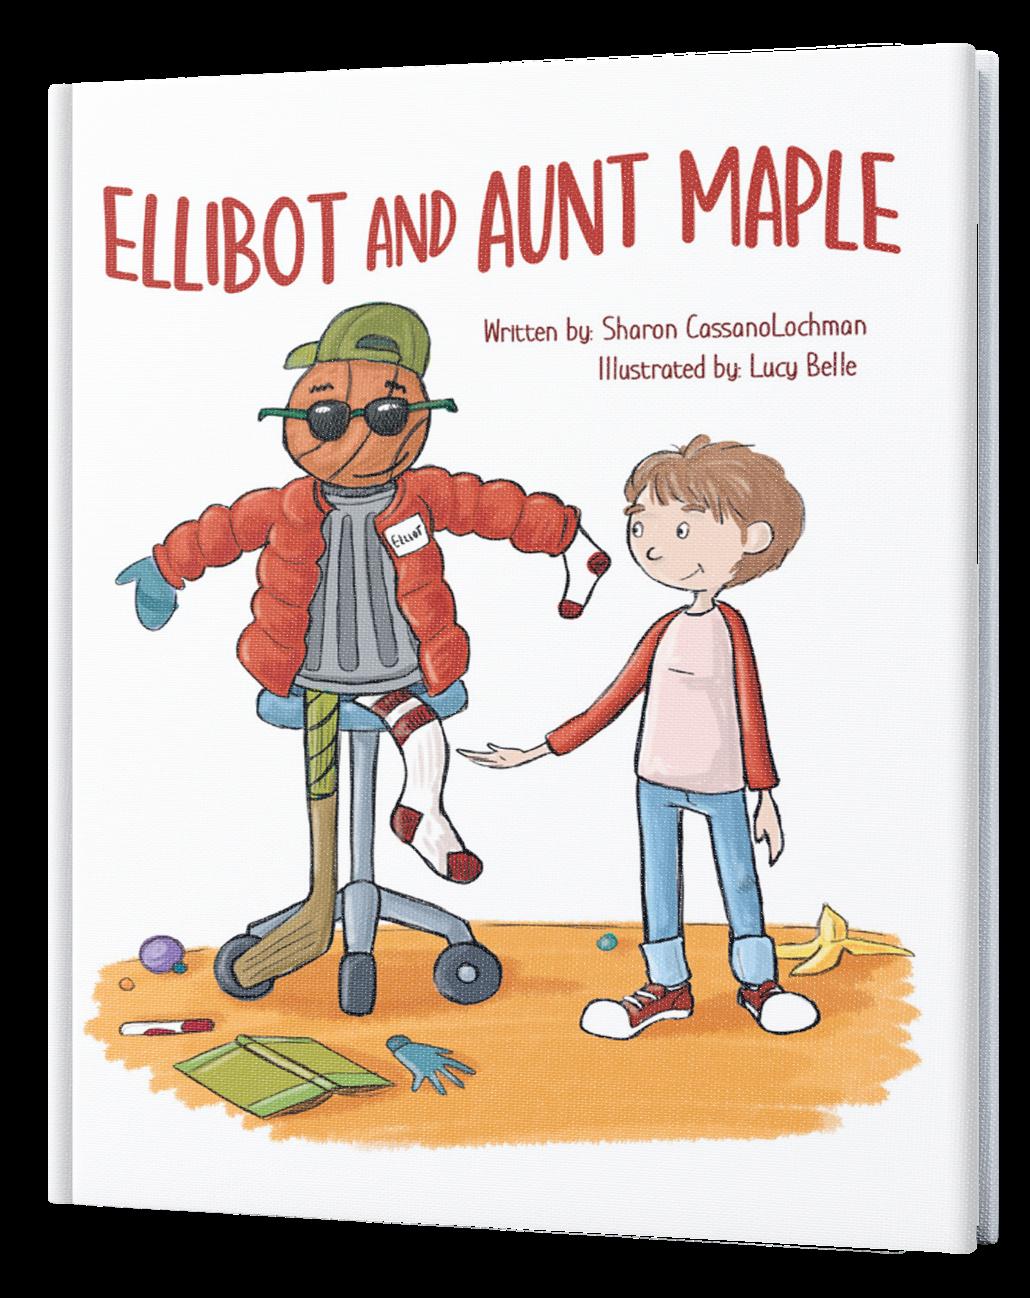 Ellibot and Aunt Maple